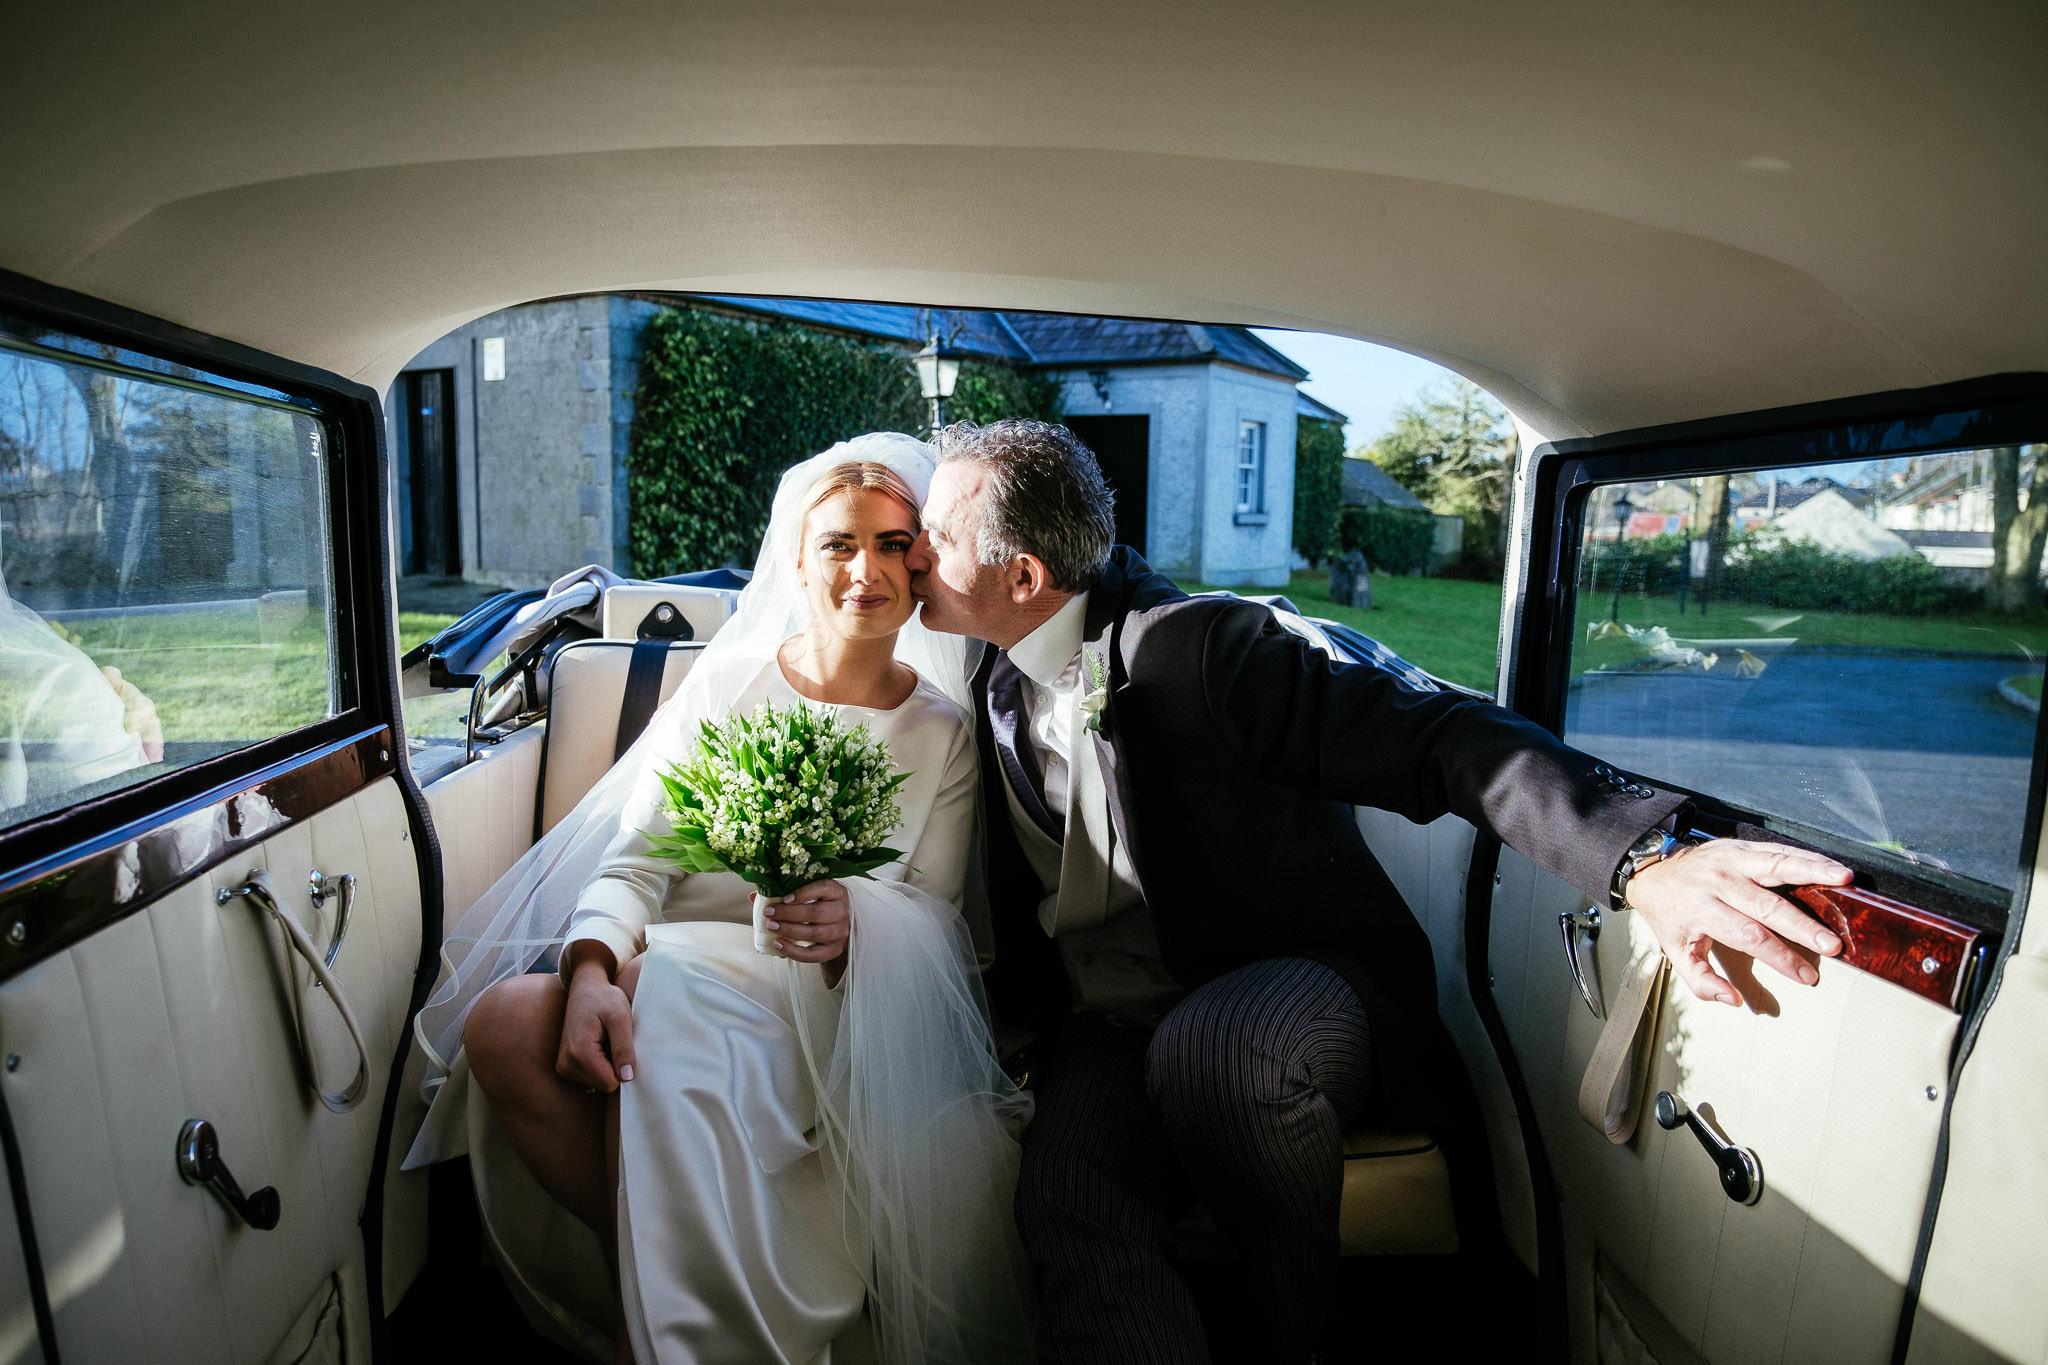 Virginia park lodge Wedding Photographer 51